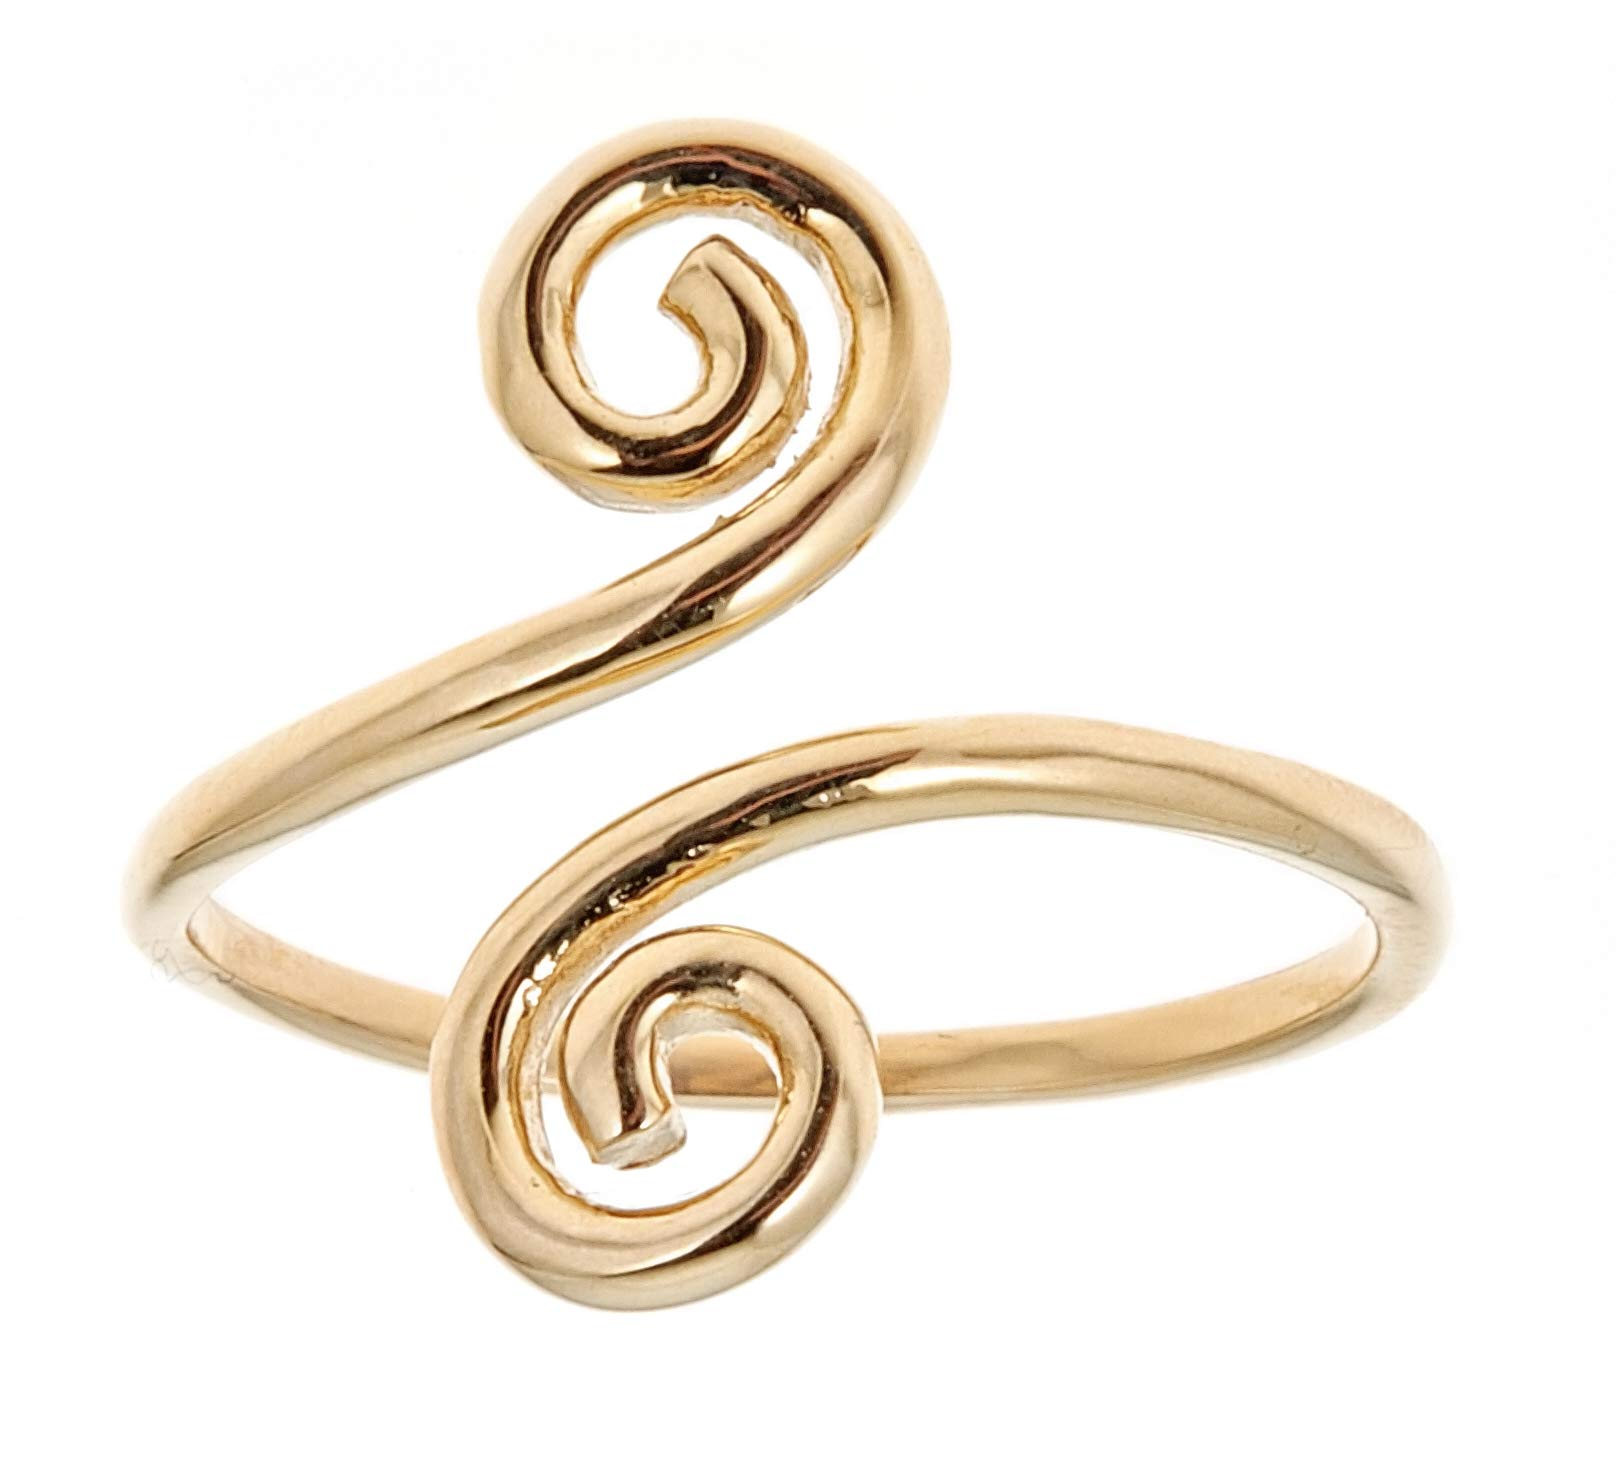 Ritastephens 14k Solid Yellow Gold Swirl Adjustable Ring or Toe Ring by Ritastephens